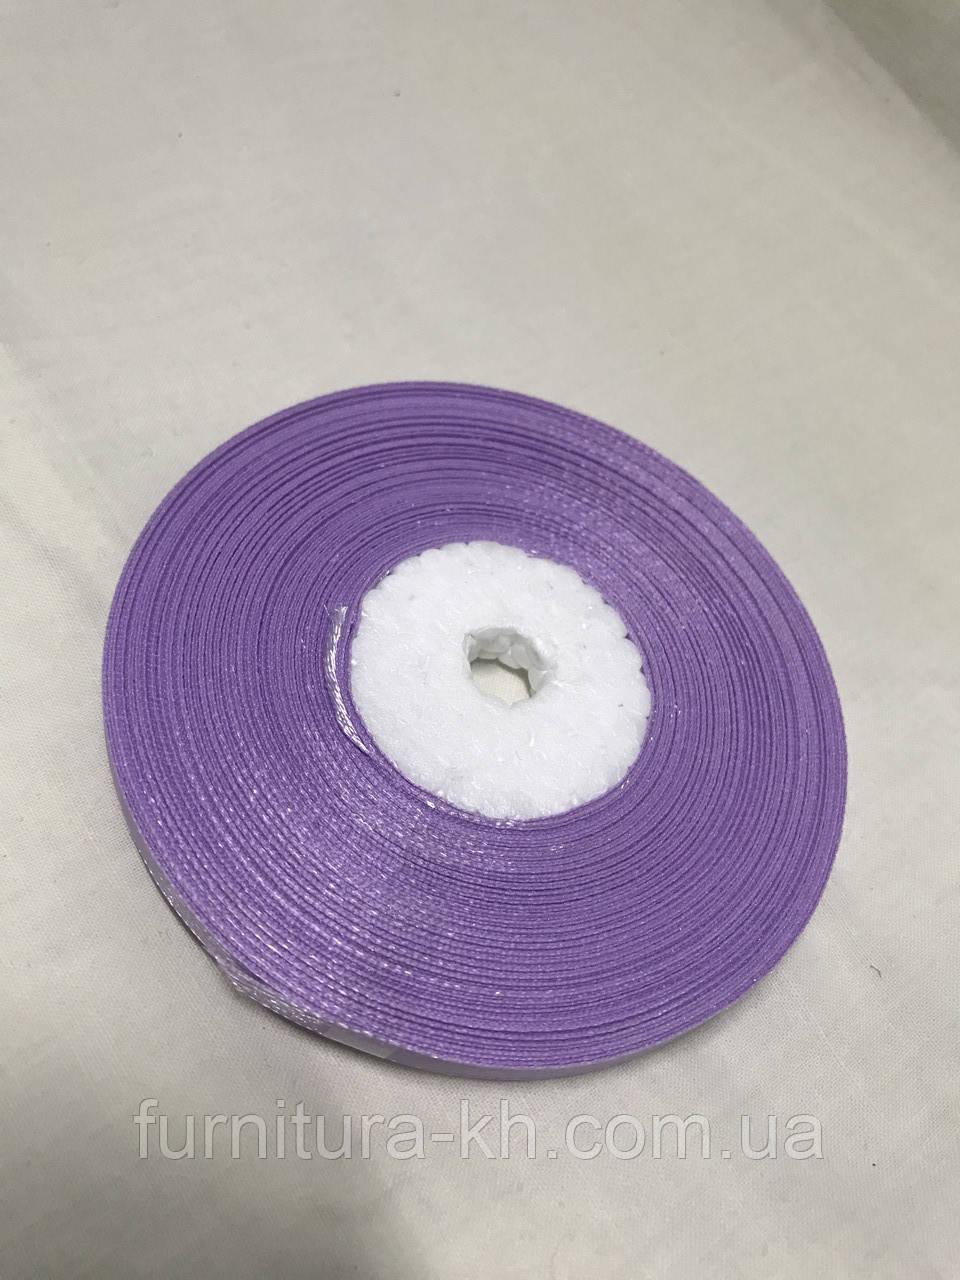 Лента атласная,ширина 0,5 см (33 м ) цвет светло-сиреневый